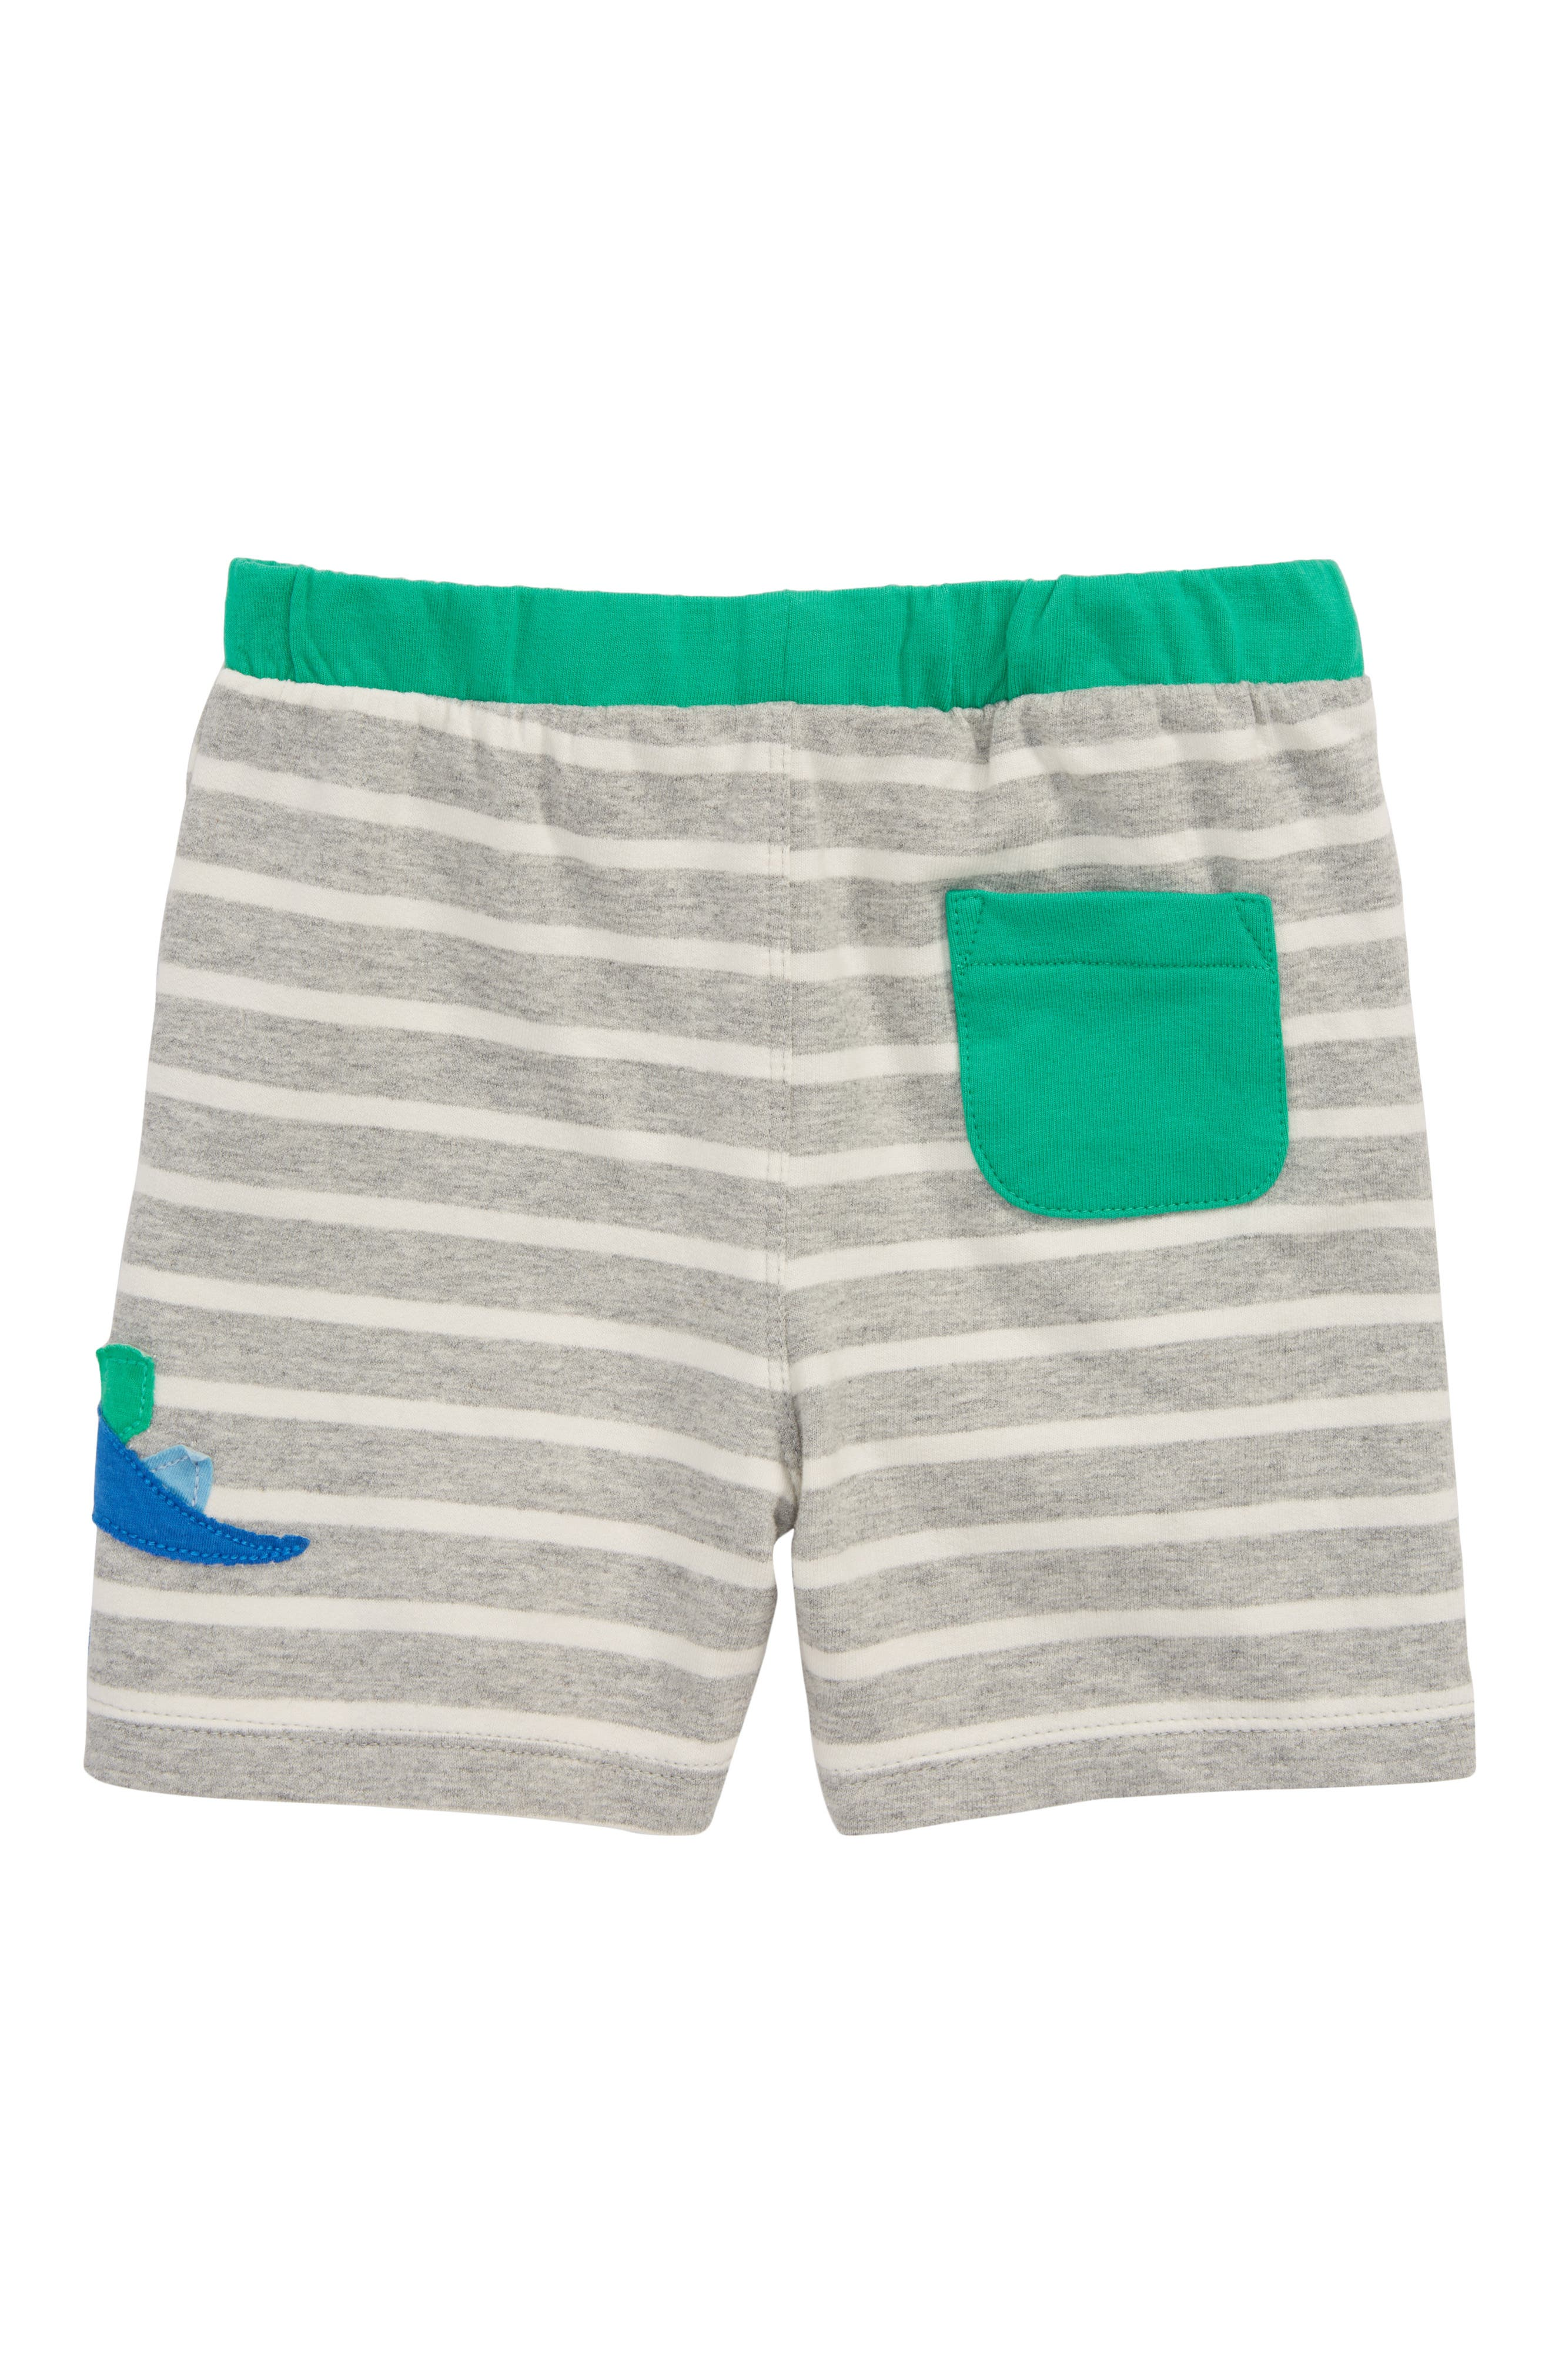 Appliqué Jersey Shorts,                             Alternate thumbnail 2, color,                             Grey Marl